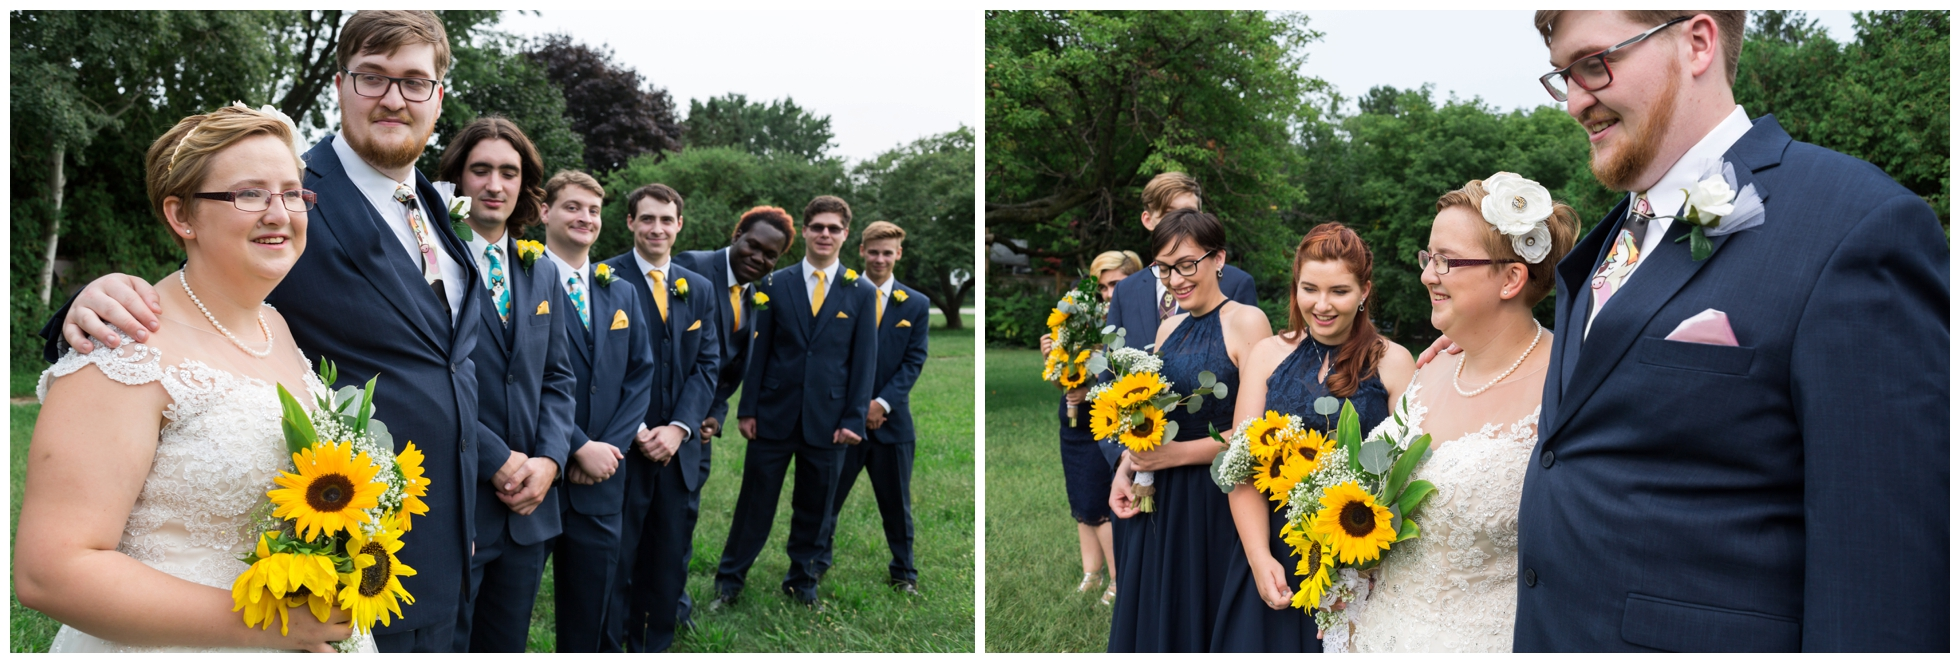 Toronto Wedding Chris Kate (Selena Phillips-Boyle)_0012.jpg